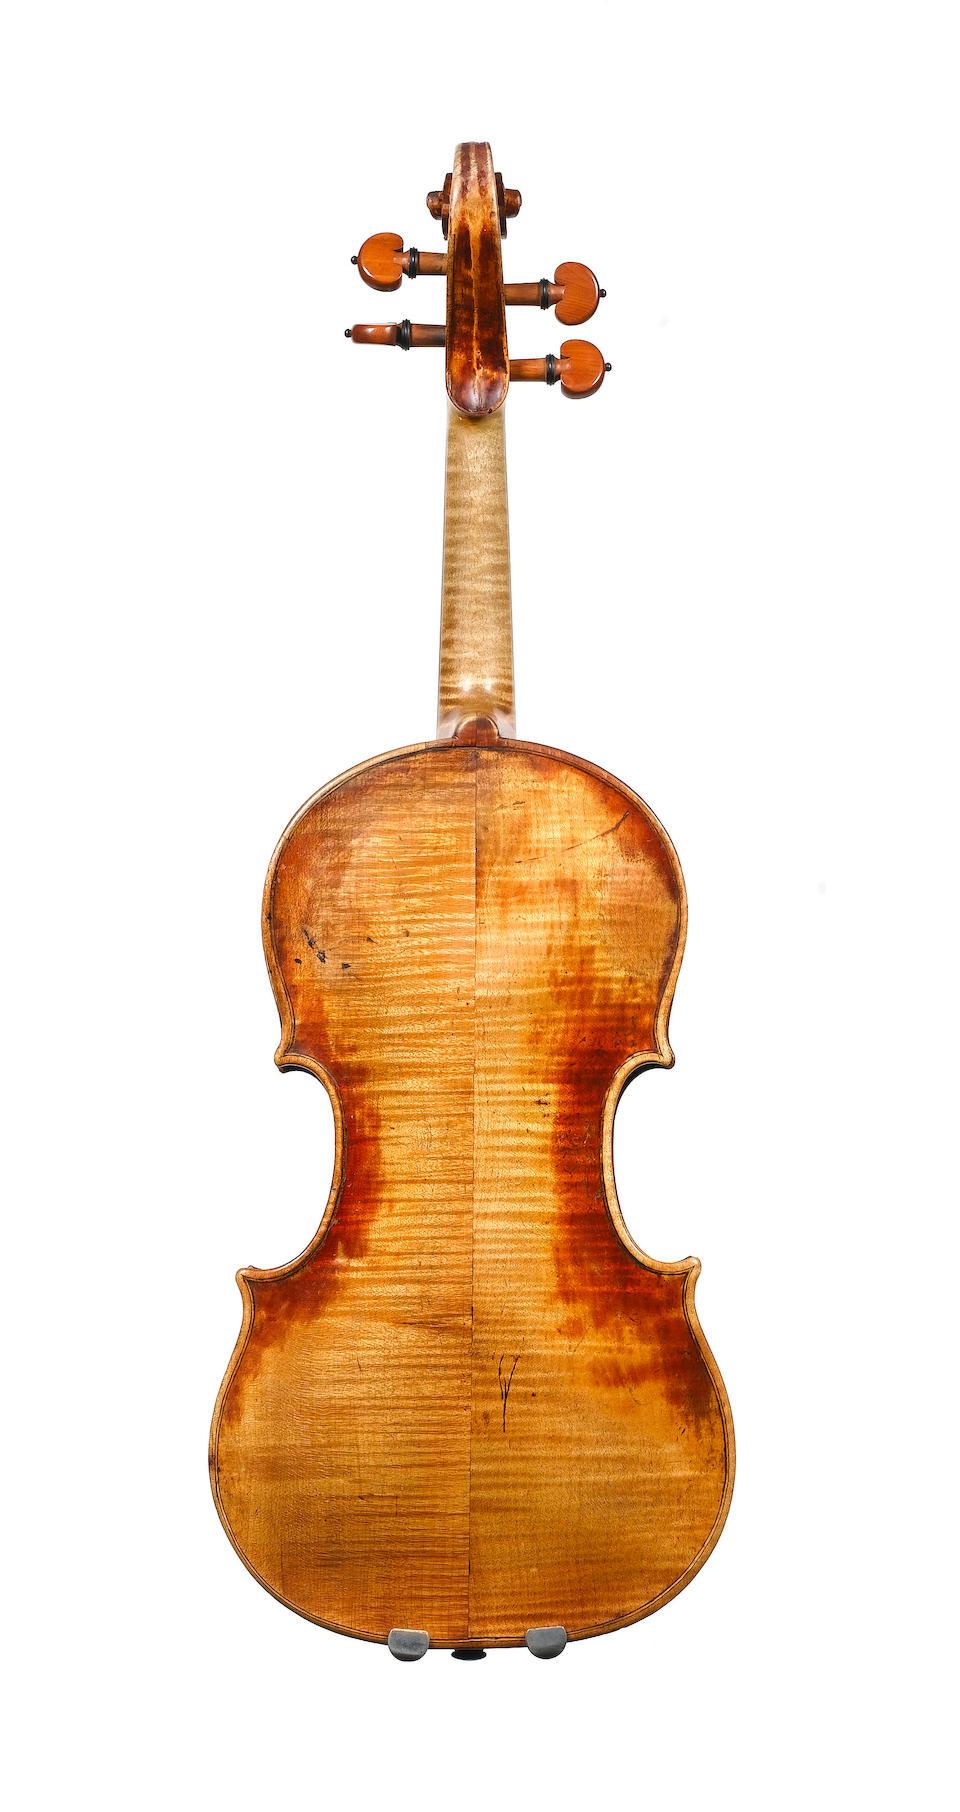 A fine Milanese Violin, probably by Giovanni Grancino Milan circa 1720